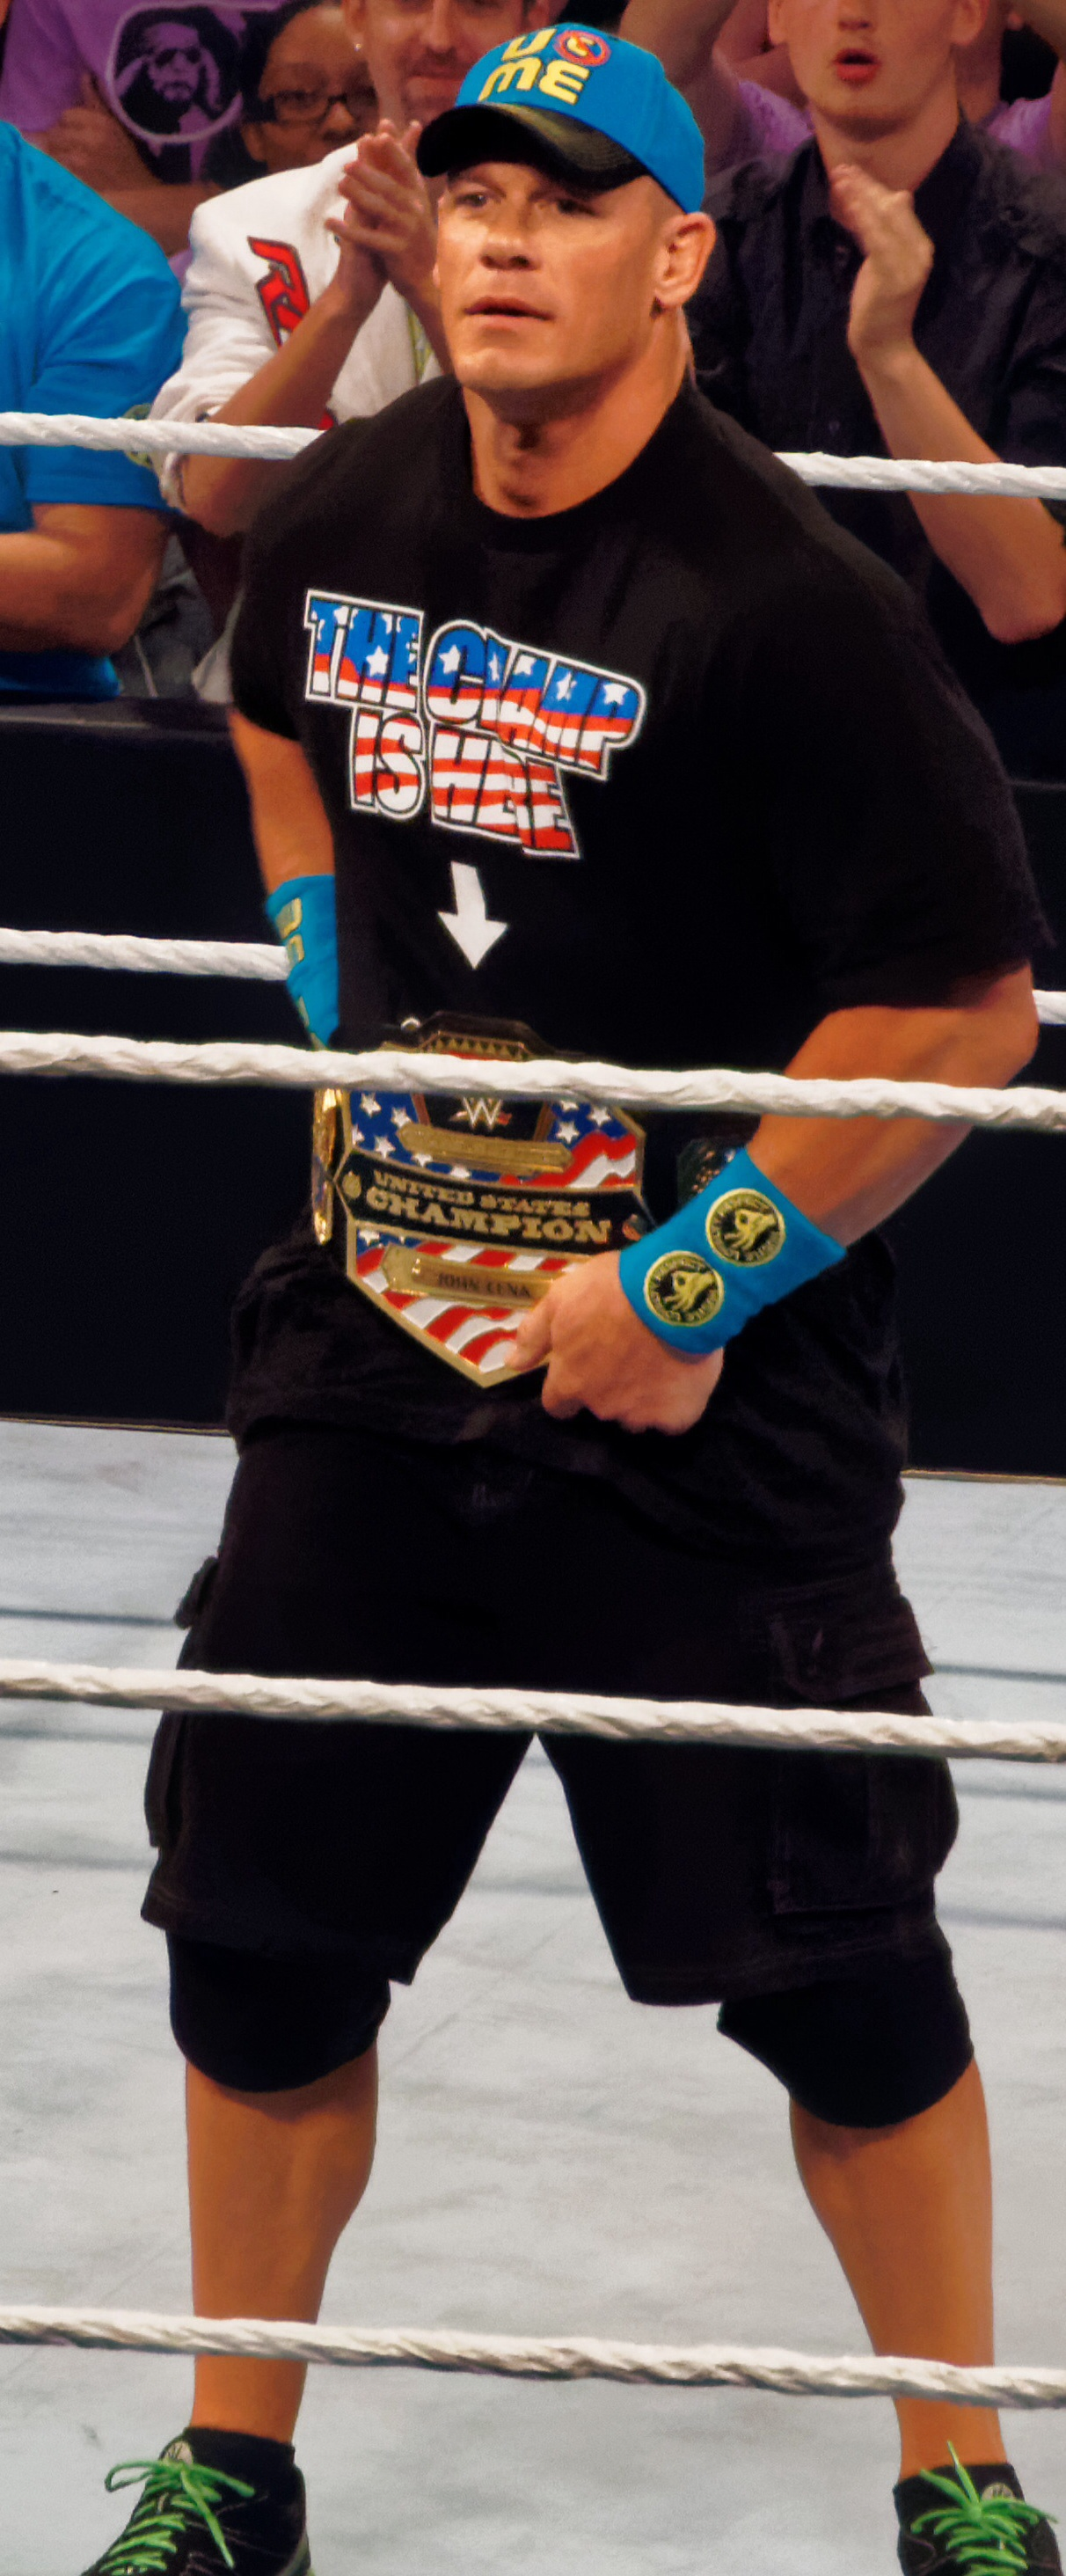 John cena - File United States Champion John Cena 2015 2 Jpg